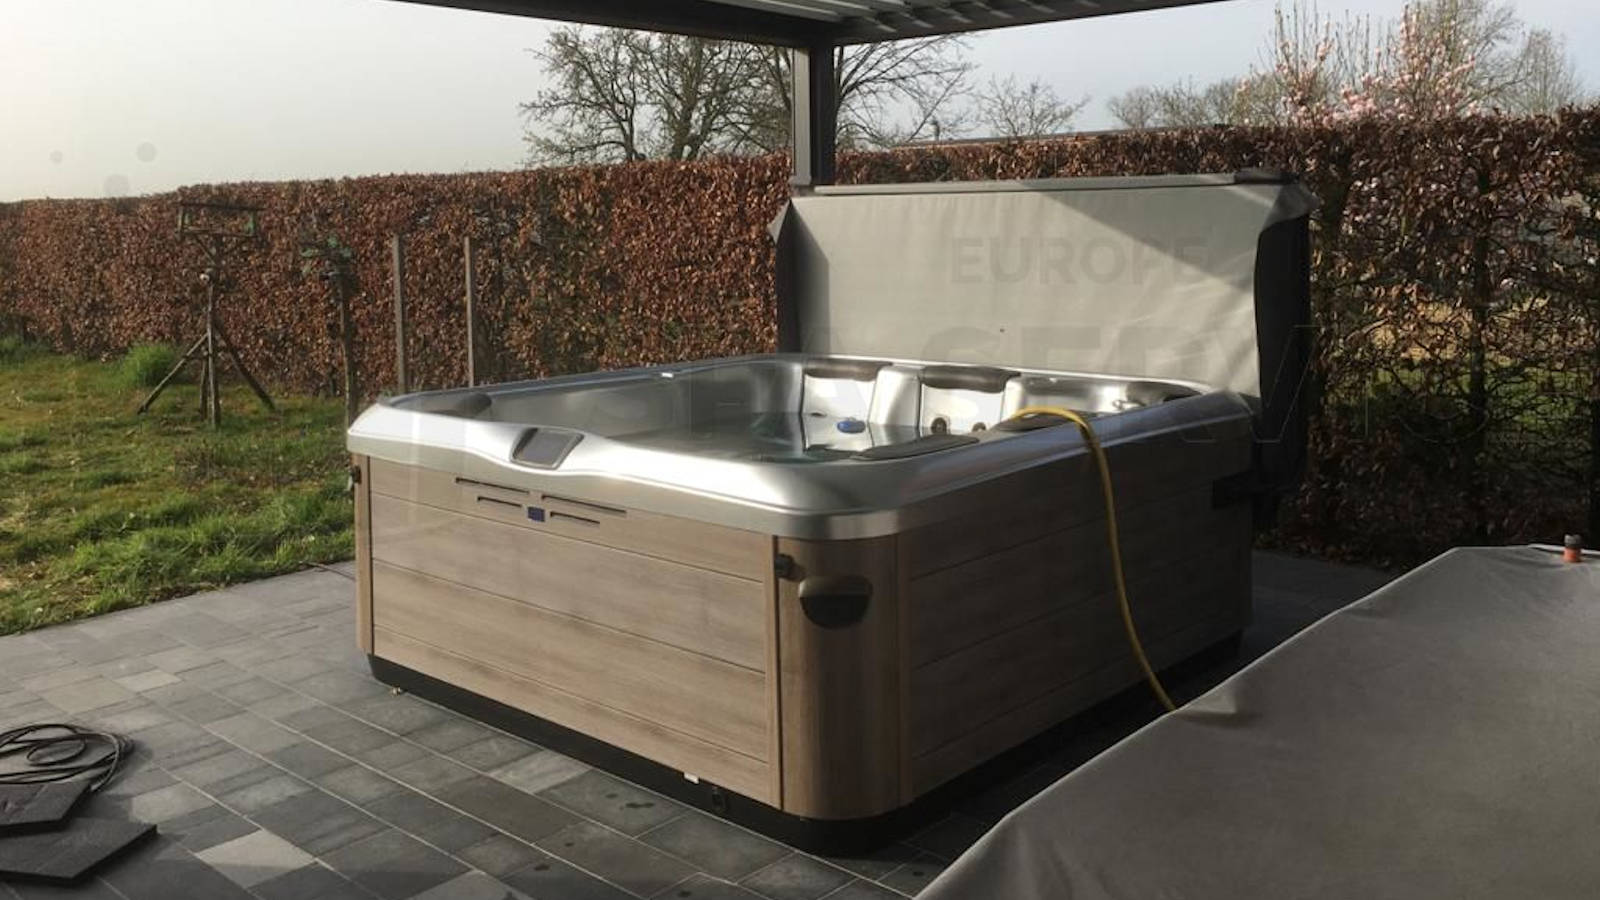 Plaatsing van een Villeroy & Boch A8D spa in Klinge België